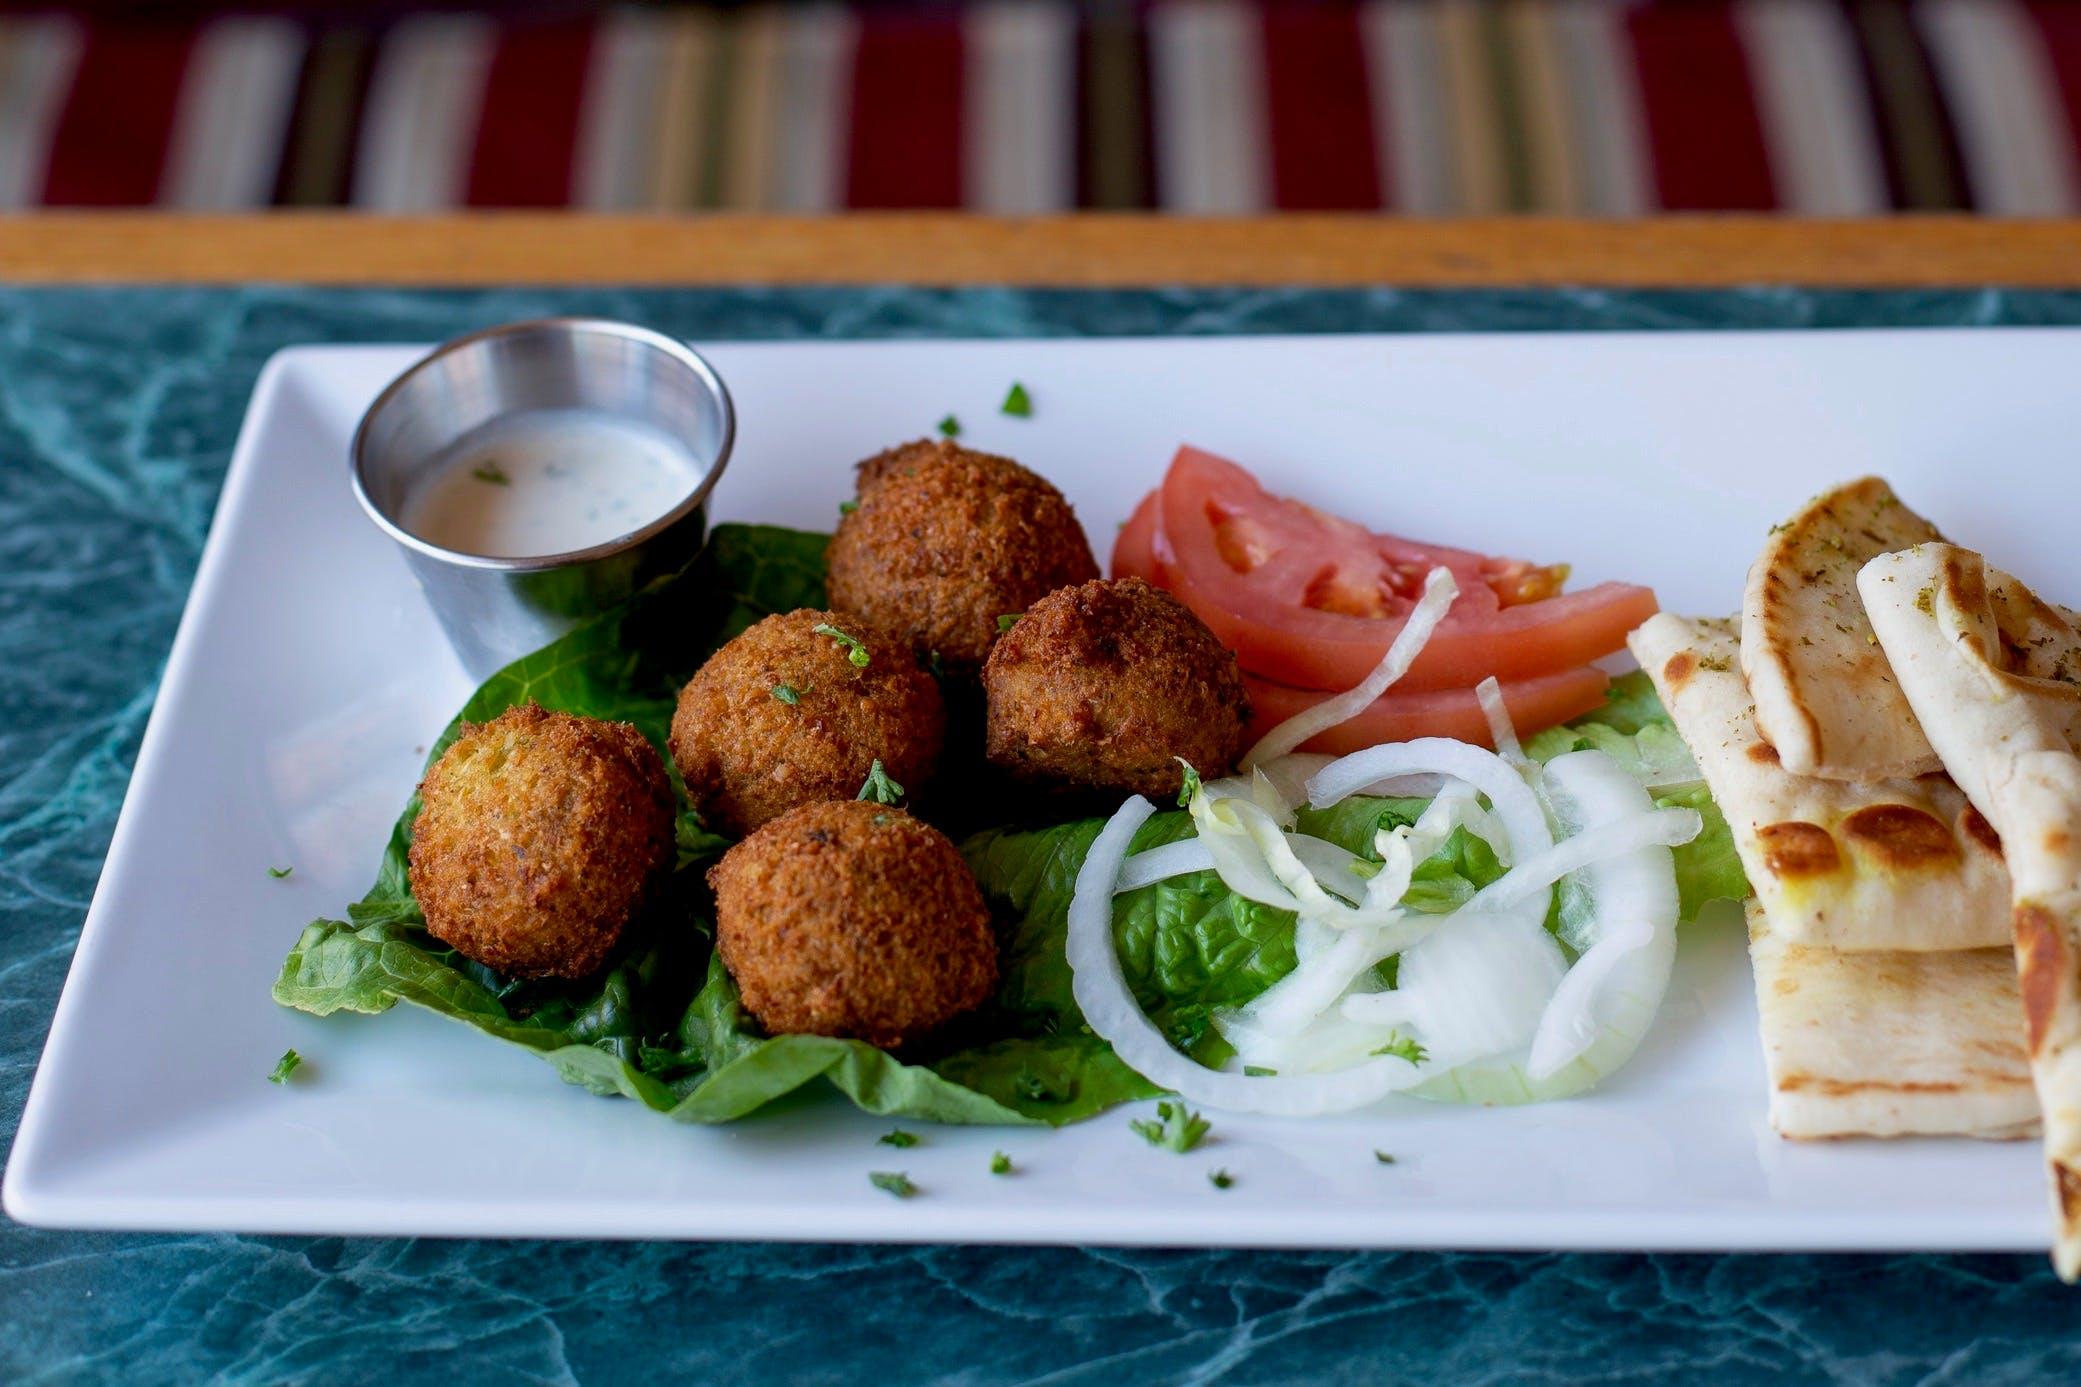 Falafel from Aladdin Cafe in Lawrence, KS